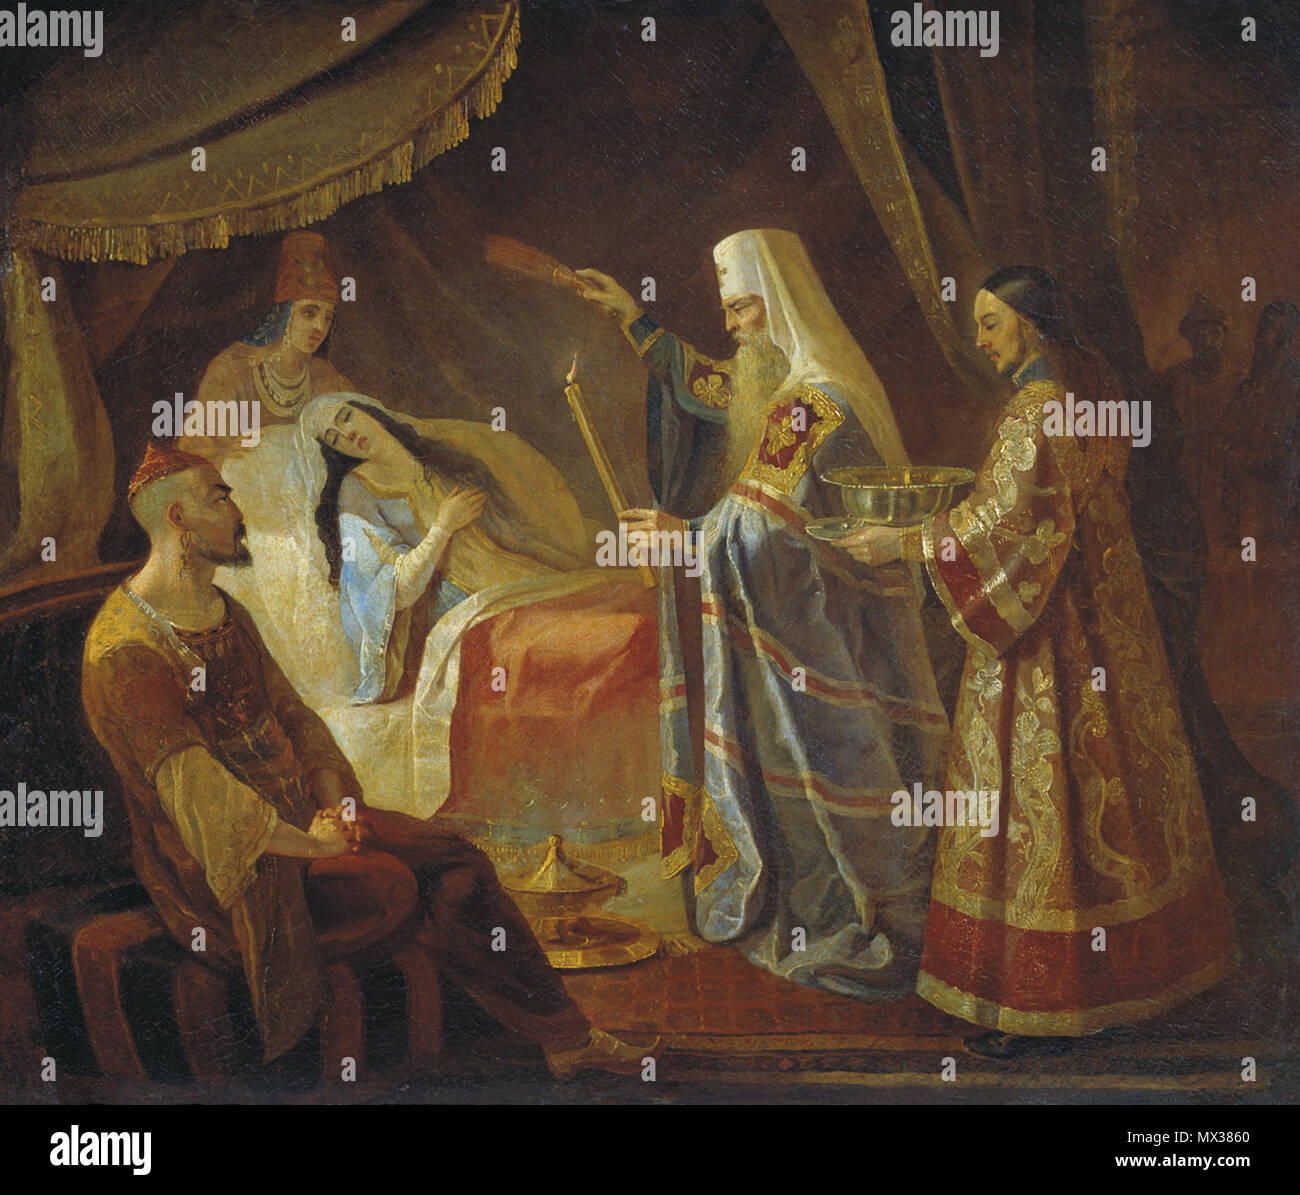 . Metropolitan Alexis Healing the Tatar Tsarina Taidula from Blindness . 19th century. Yakov Kapkov (1816-54) 35 Alessio-Kapkov Stock Photo